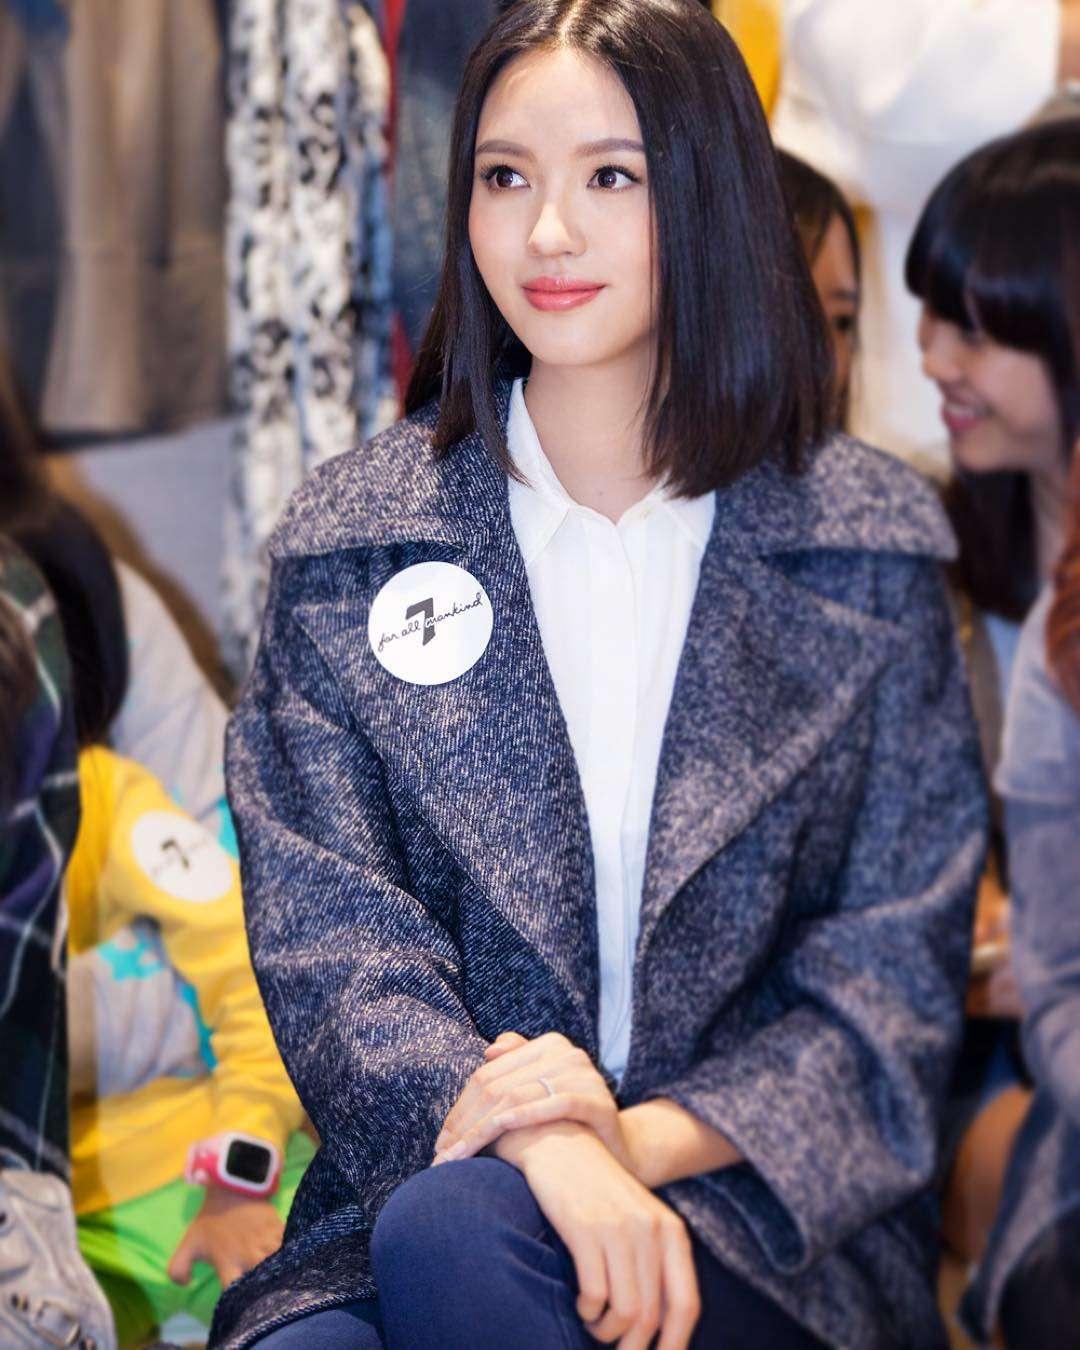 zhang zilin good looking